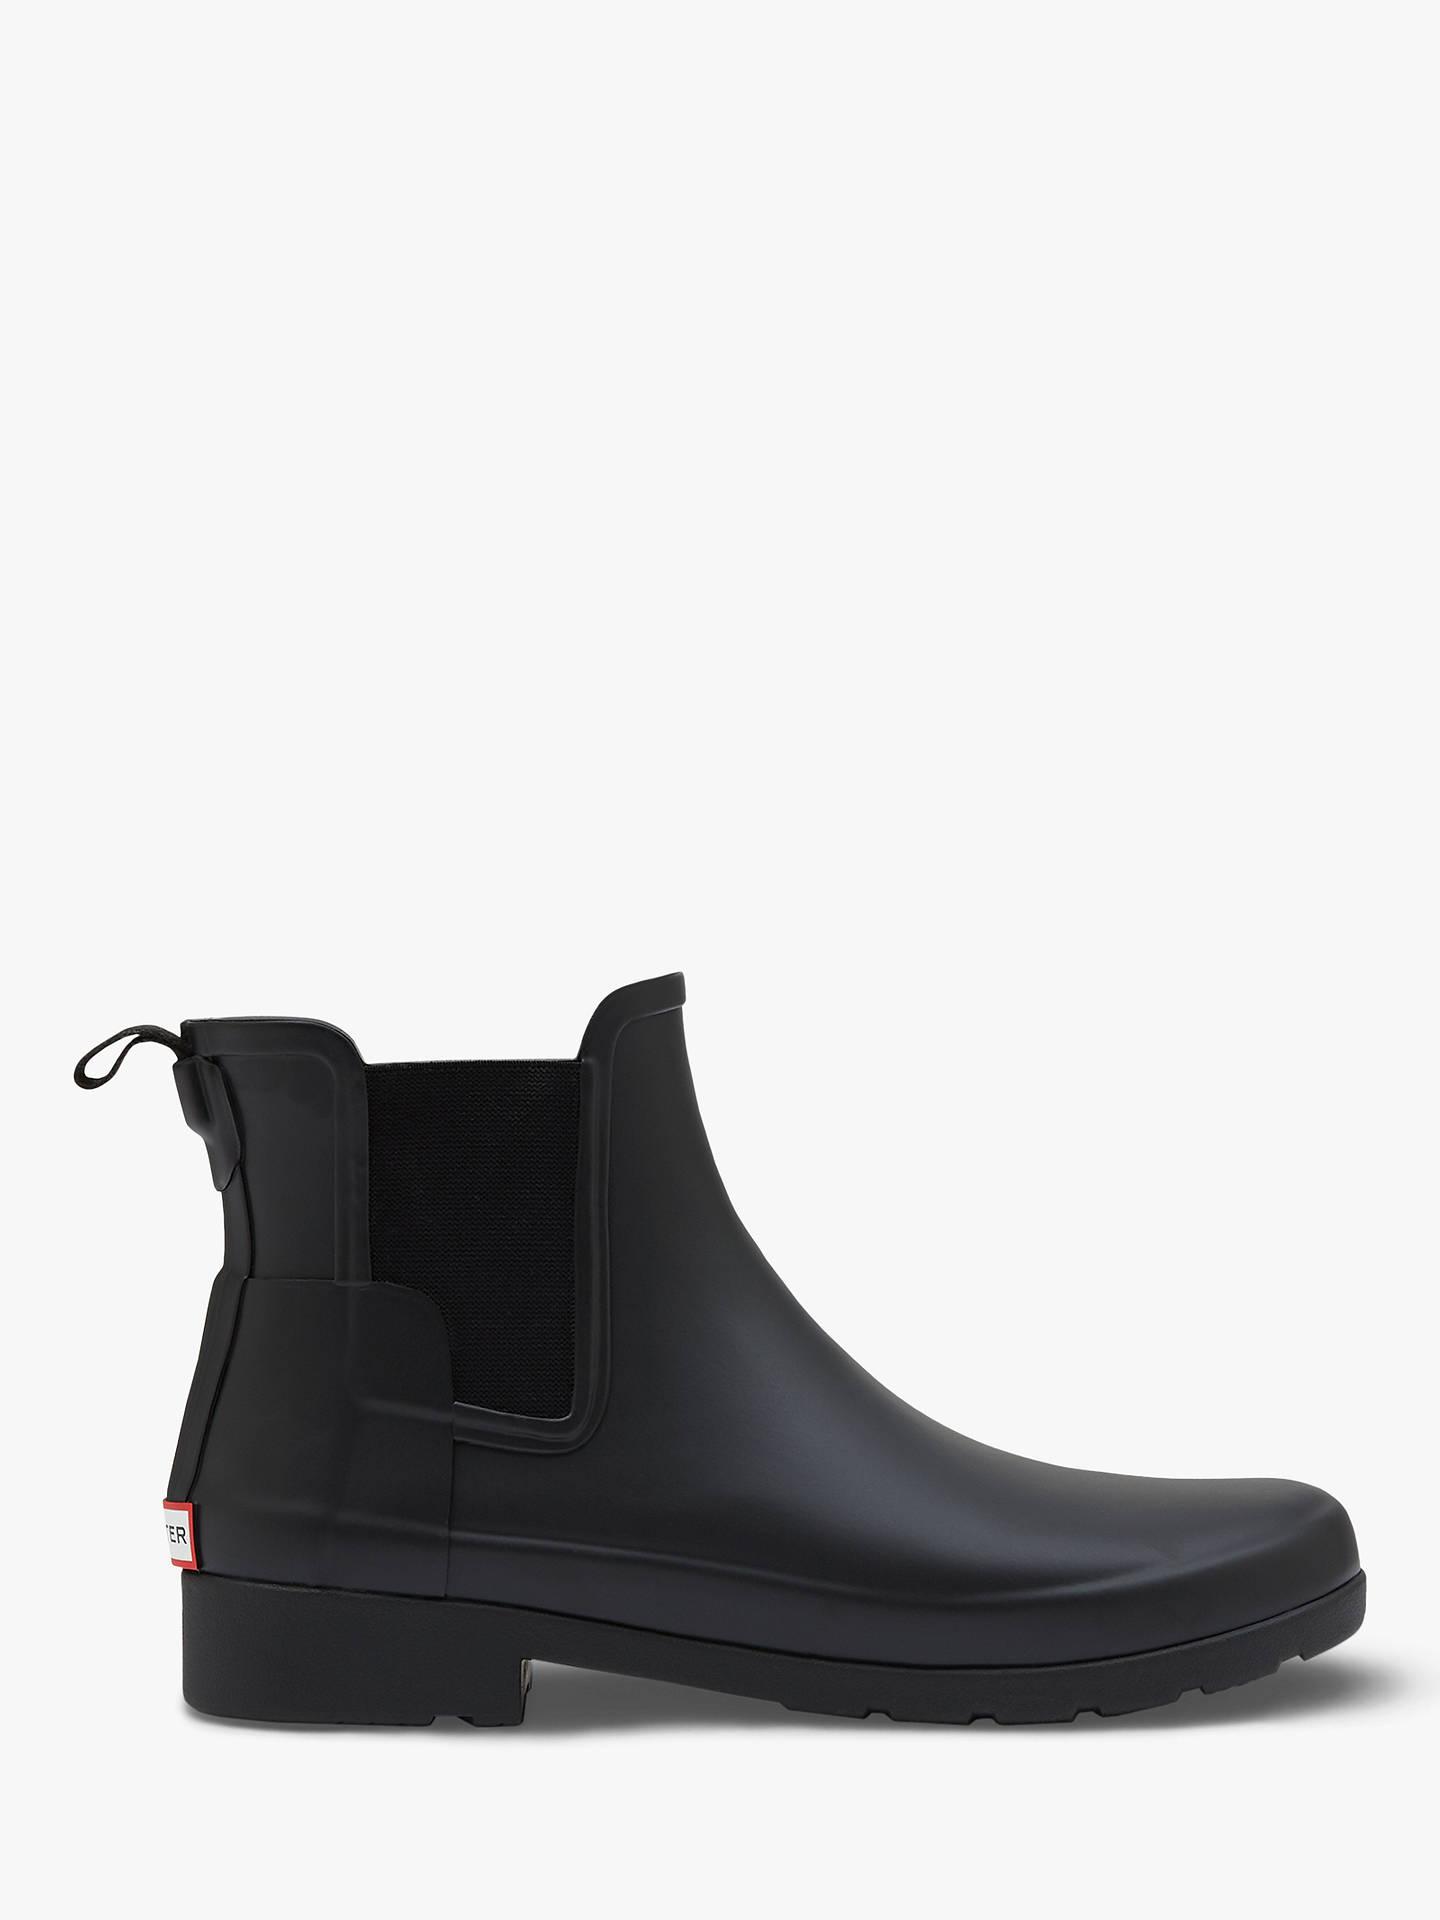 a74908bc1b6 Buy Hunter Women's Original Waterproof Refined Chelsea Wellington Boots,  Black, 4 Online at johnlewis ...